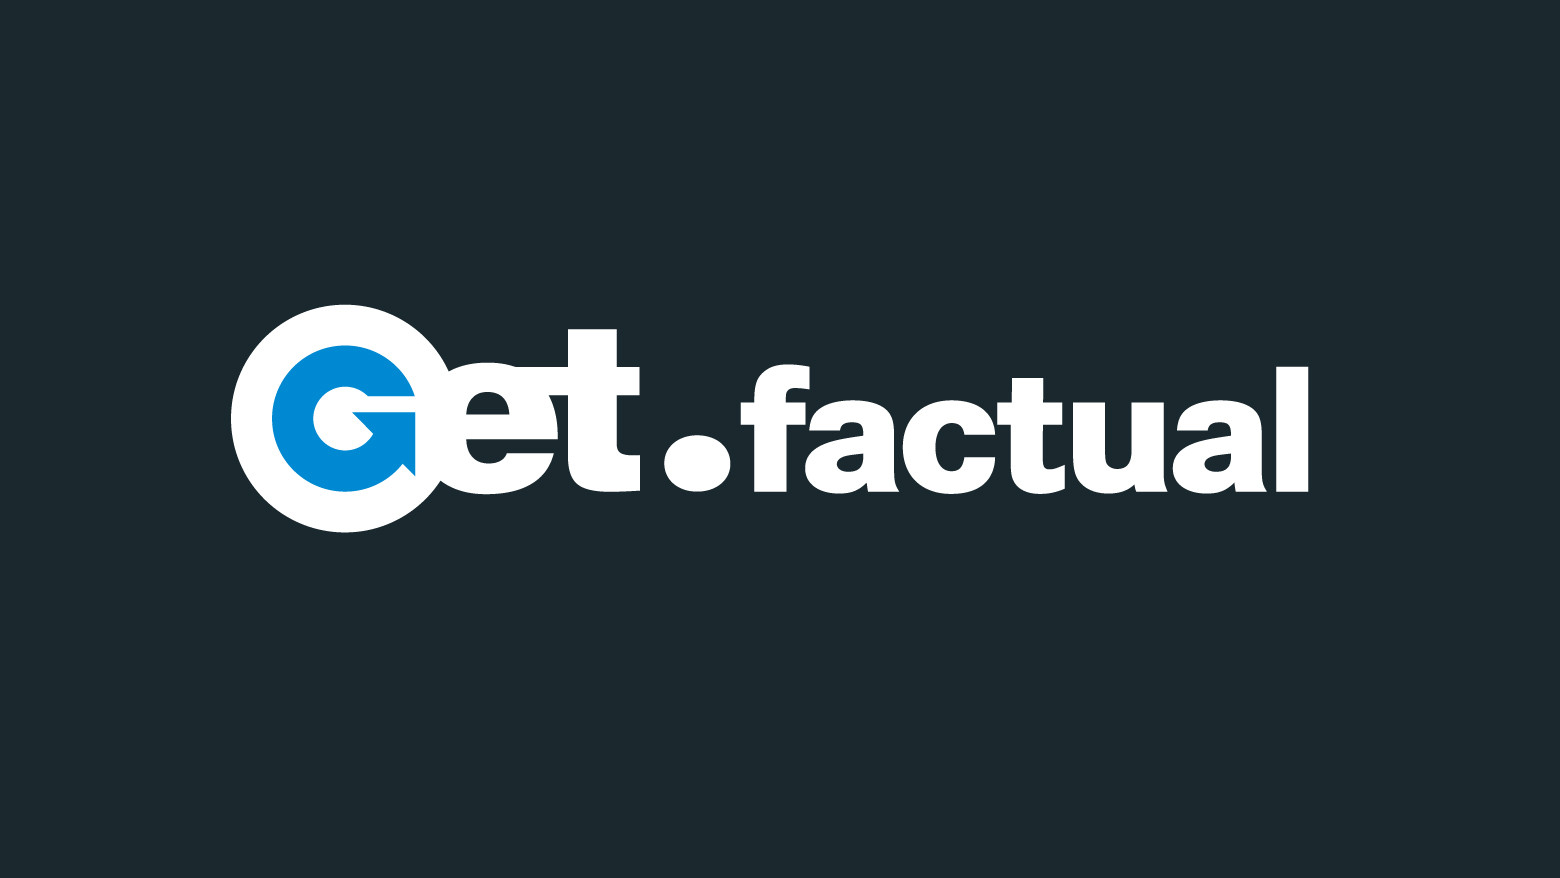 Get Factual_featuredImage.jpg